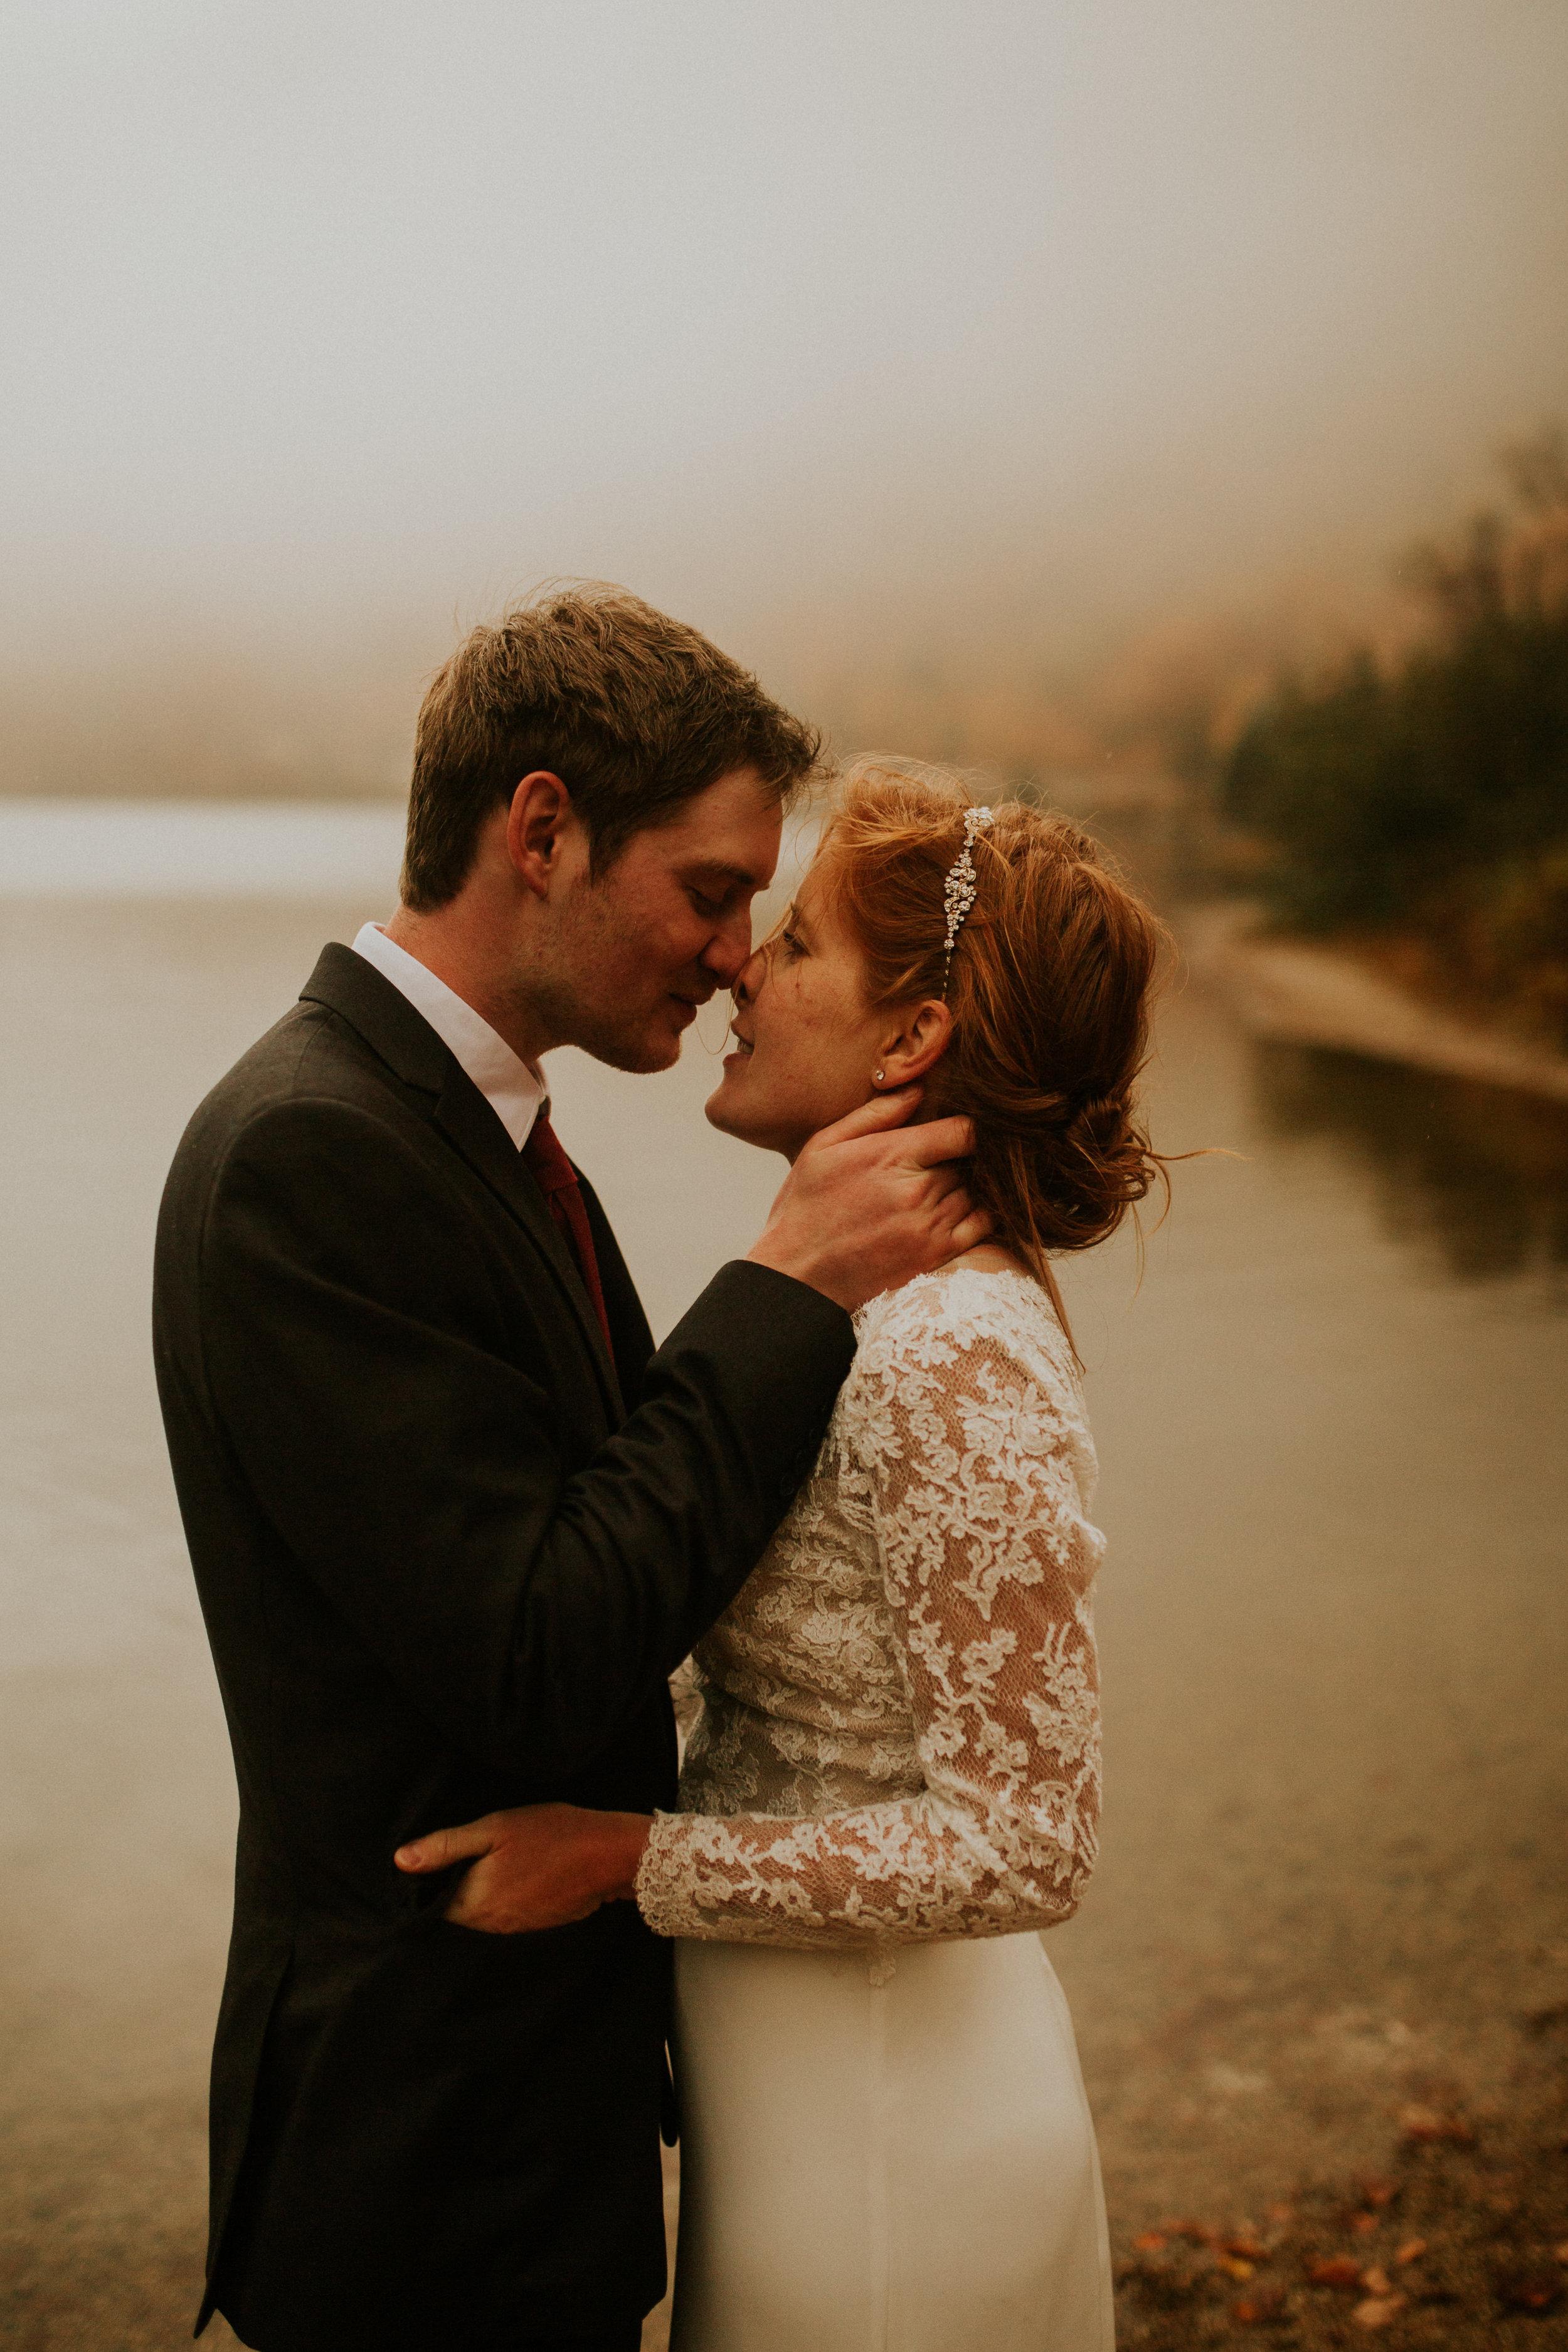 Artist-bluff-new-hampshire-elopement-white-mountains-photographer-breeanna-lasher-240.jpg